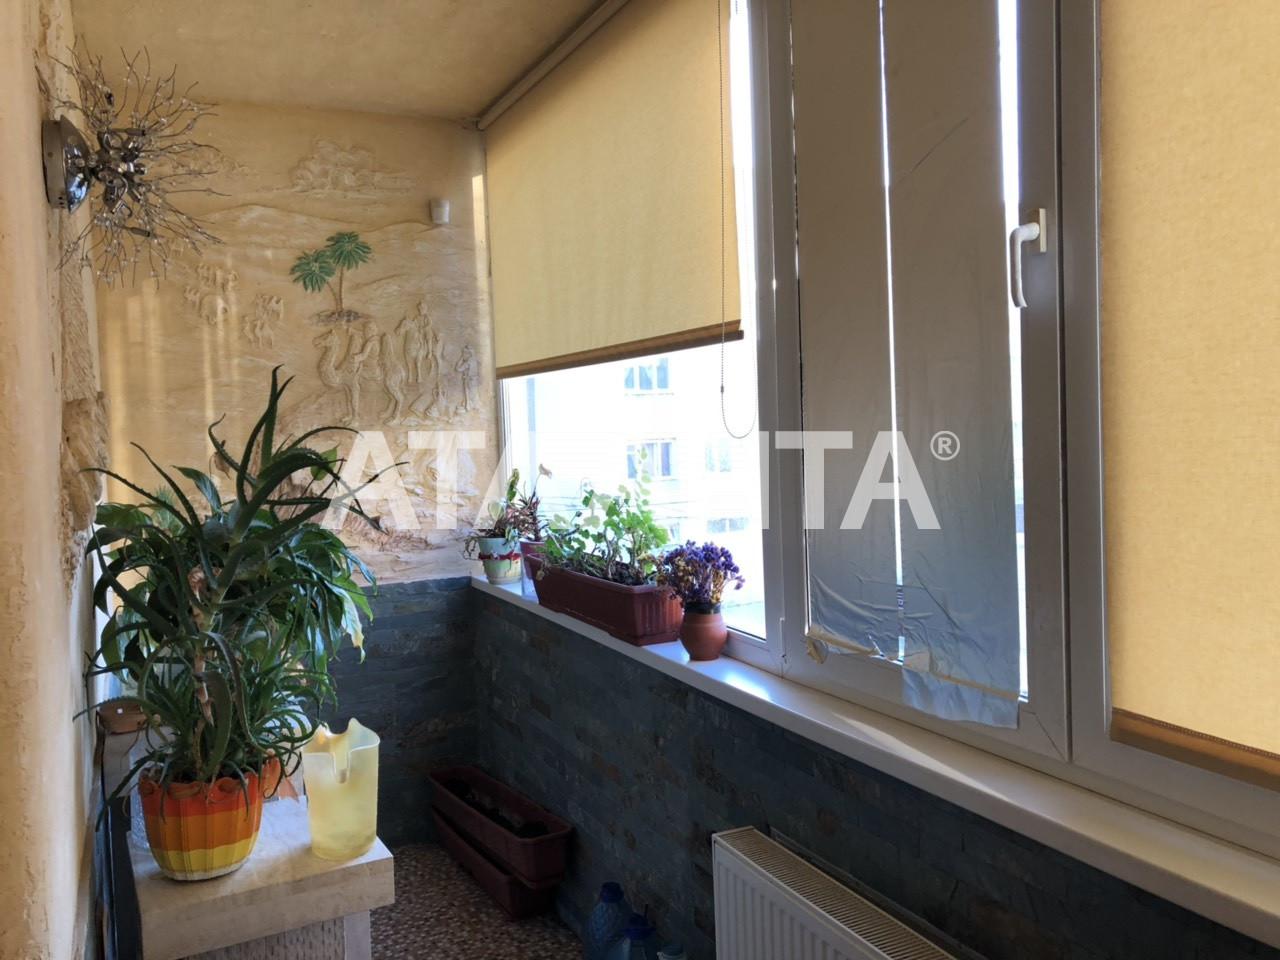 Продается 3-комнатная Квартира на ул. 1 Мая — 135 000 у.е. (фото №12)